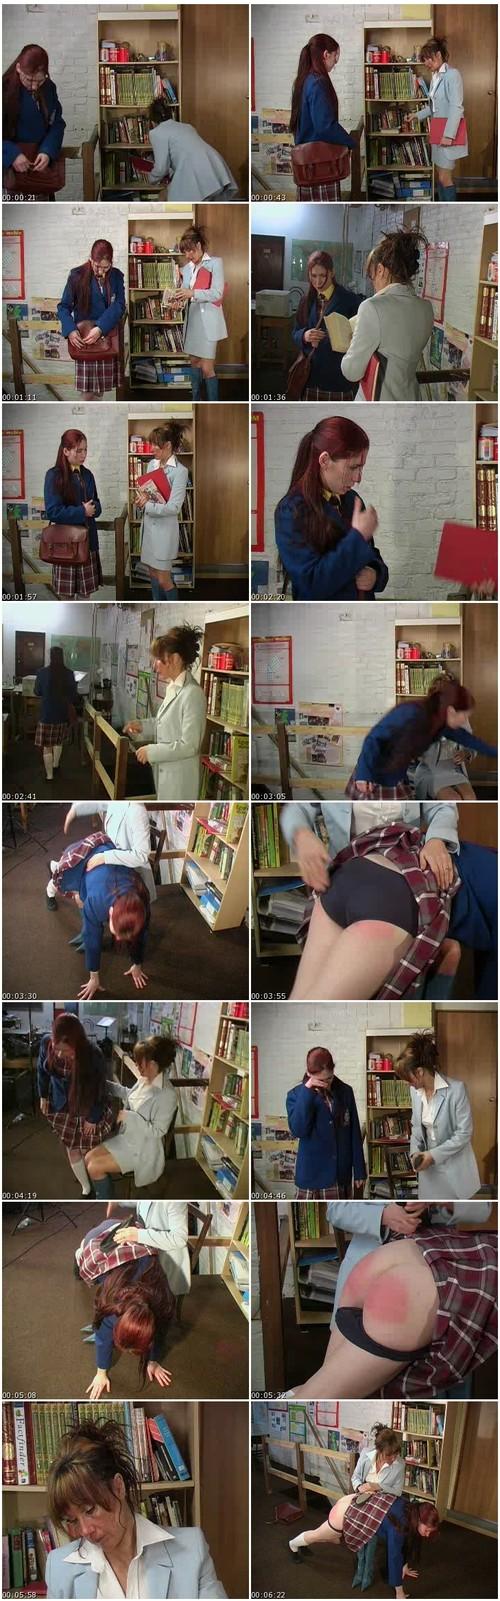 spanking067_thumb_m.jpg